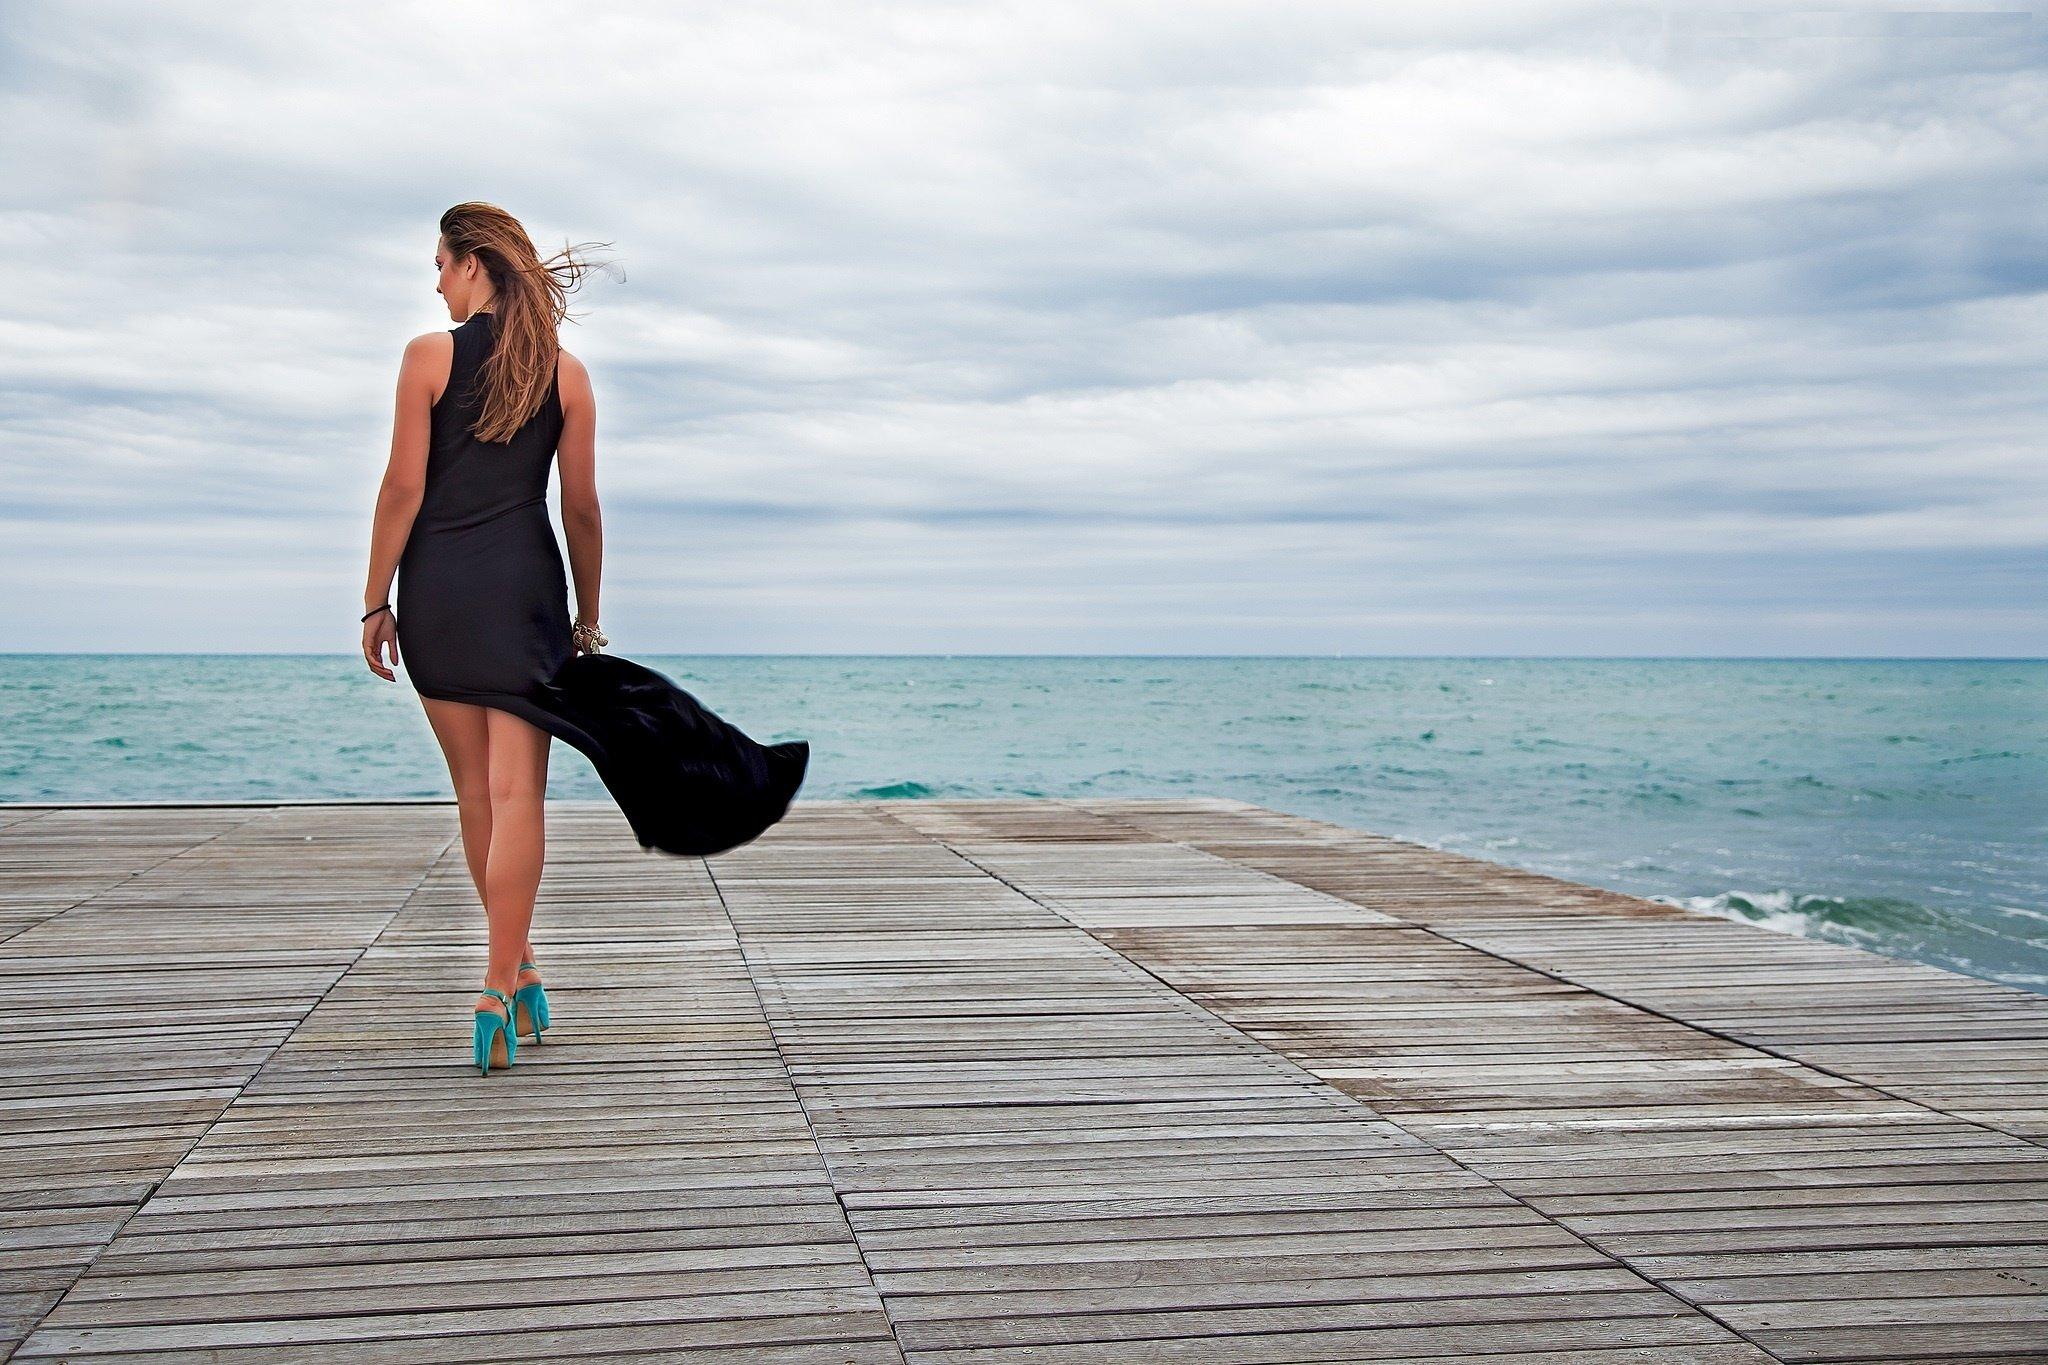 Mood Girl Sea Wind Ocean Style Fashion Wallpaper 2048x1365 331415 Wallpaperup